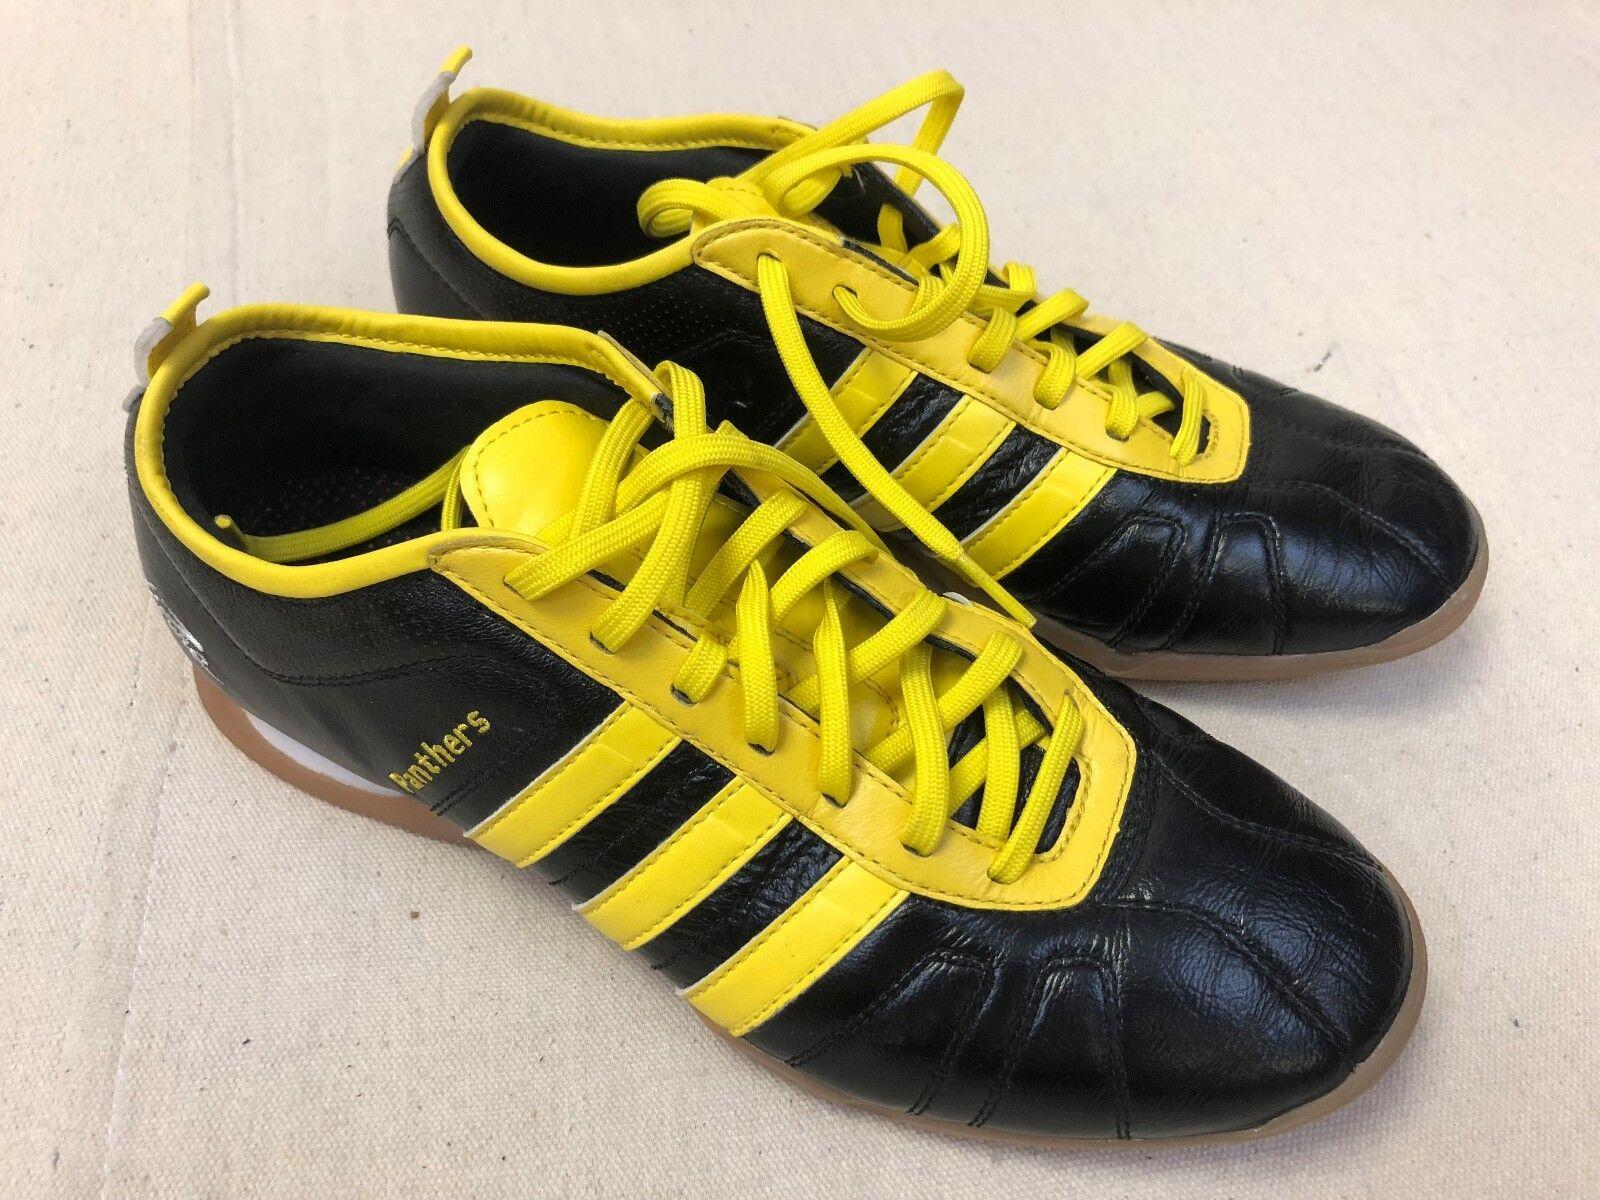 Adidas AdiPure Sz 8.5 Panthers Black Yellow Athletic shoes Medium Fit S12